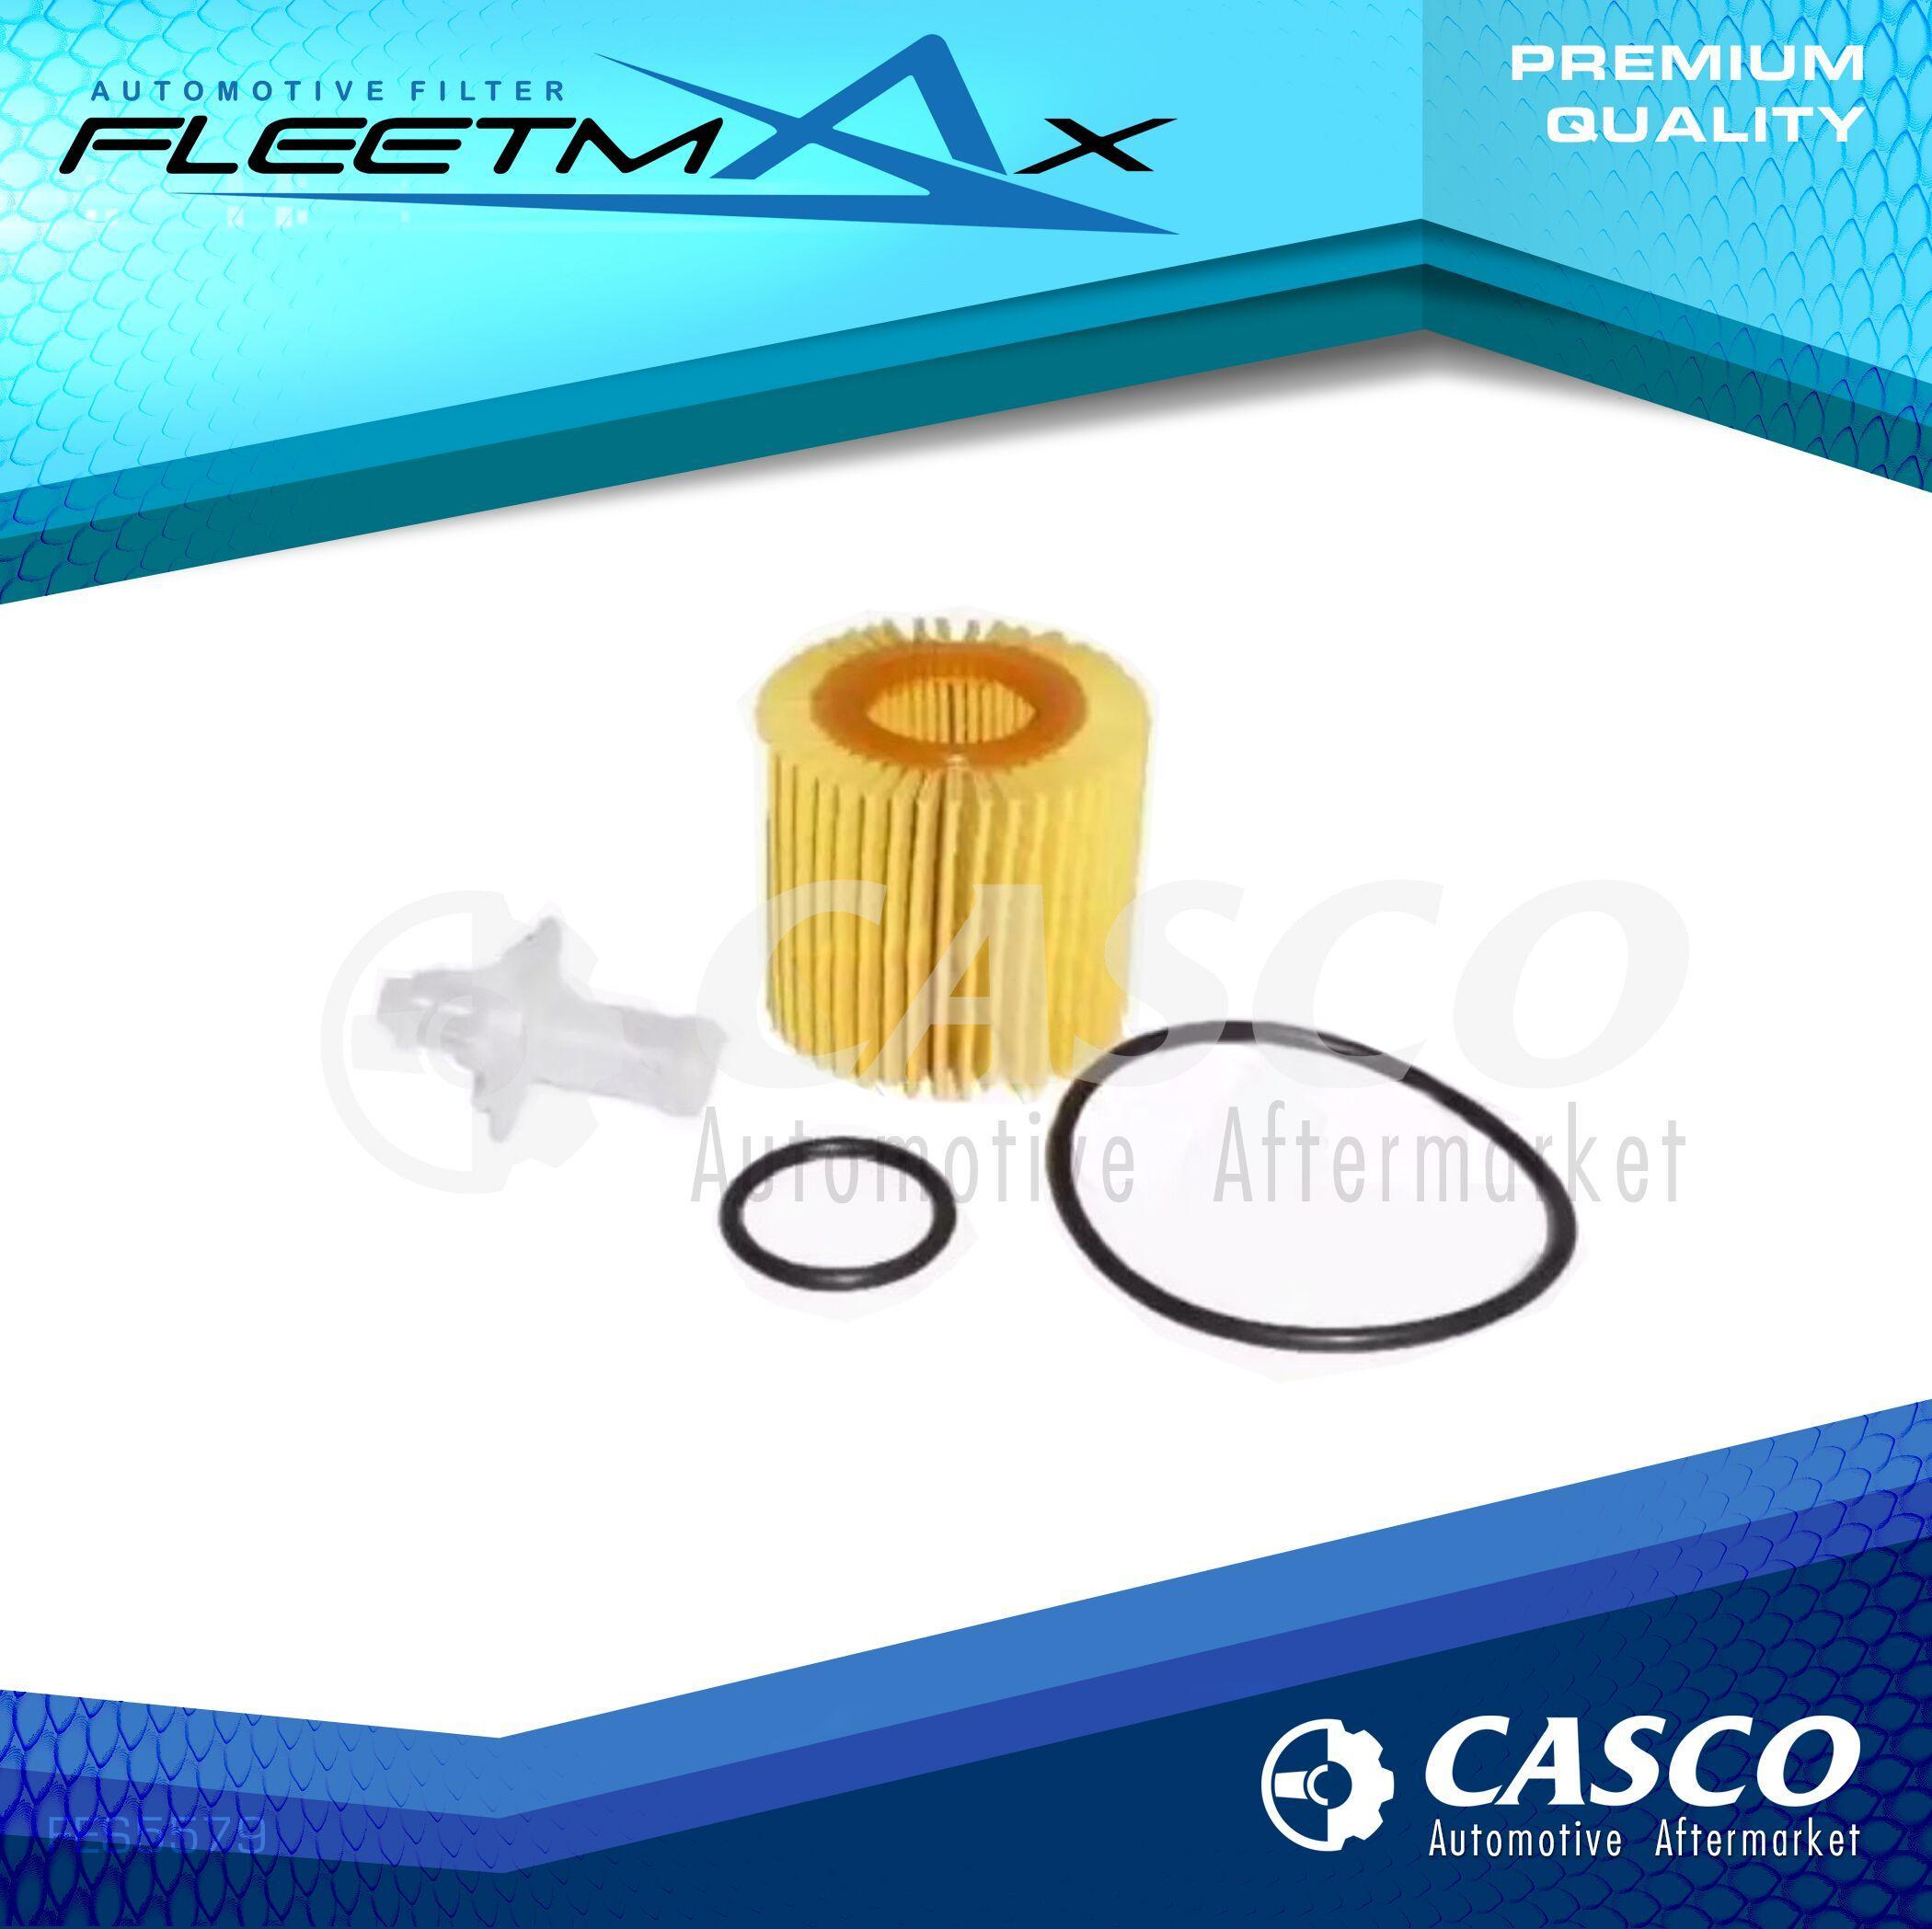 fleetmax oil filter fes5579 for toyota corolla altis dual vvt-i 2009-2018